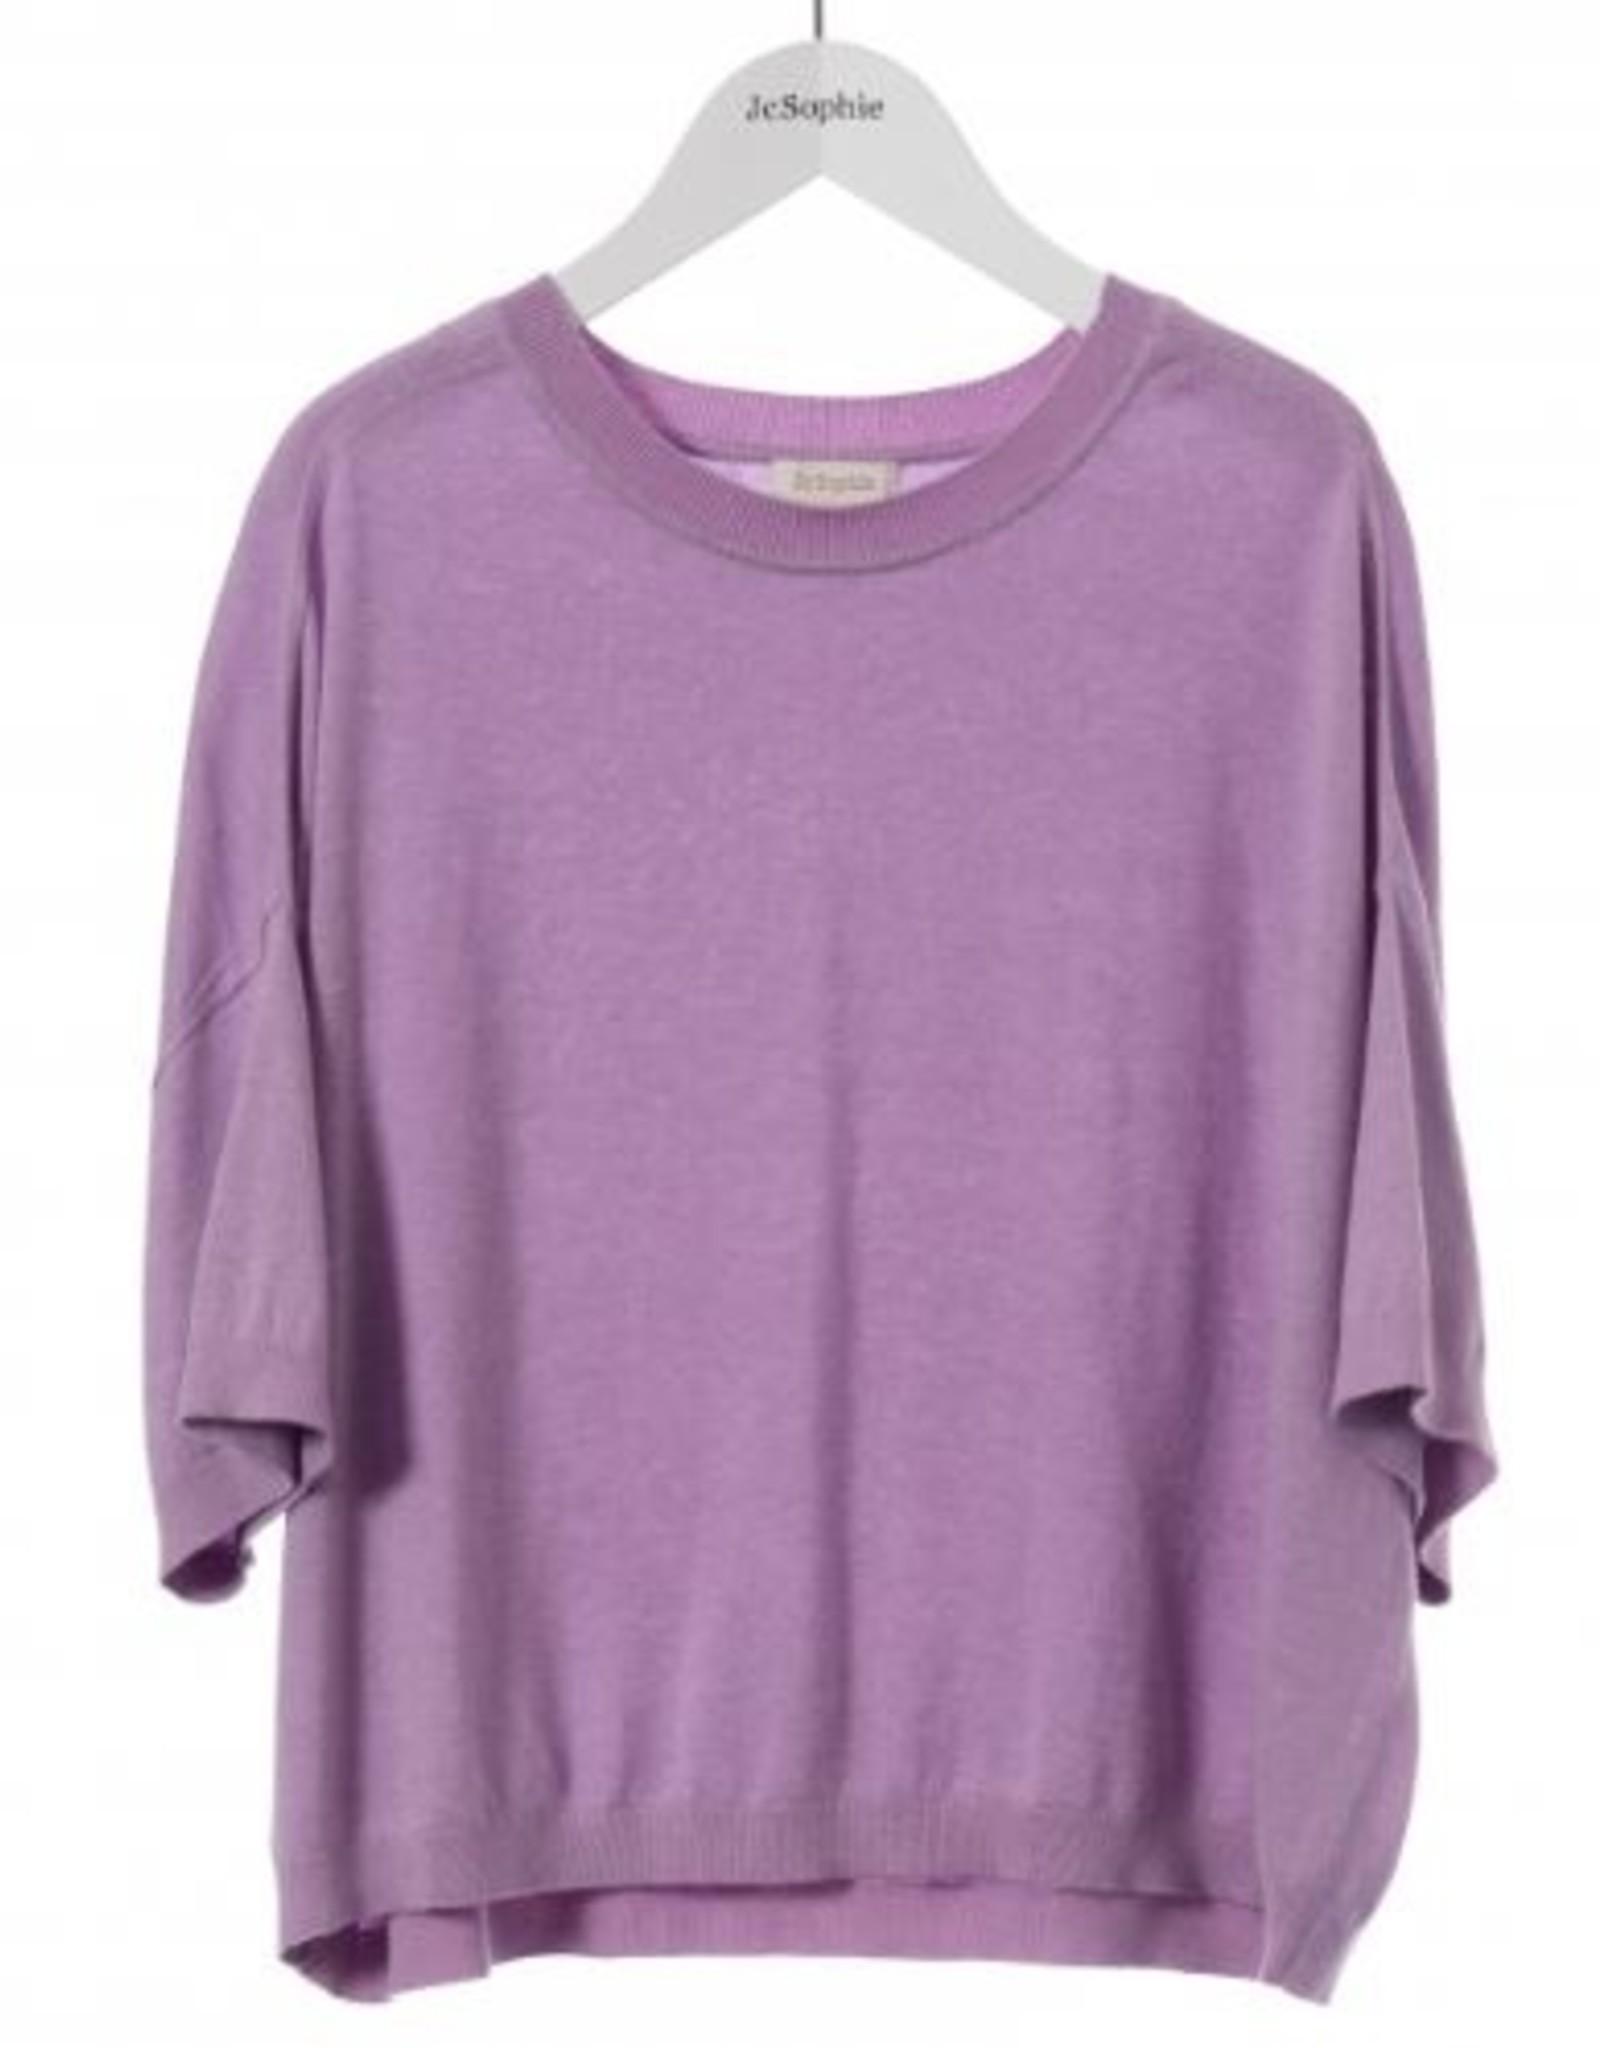 JcSophie Pullover Korte Mouw Lavender